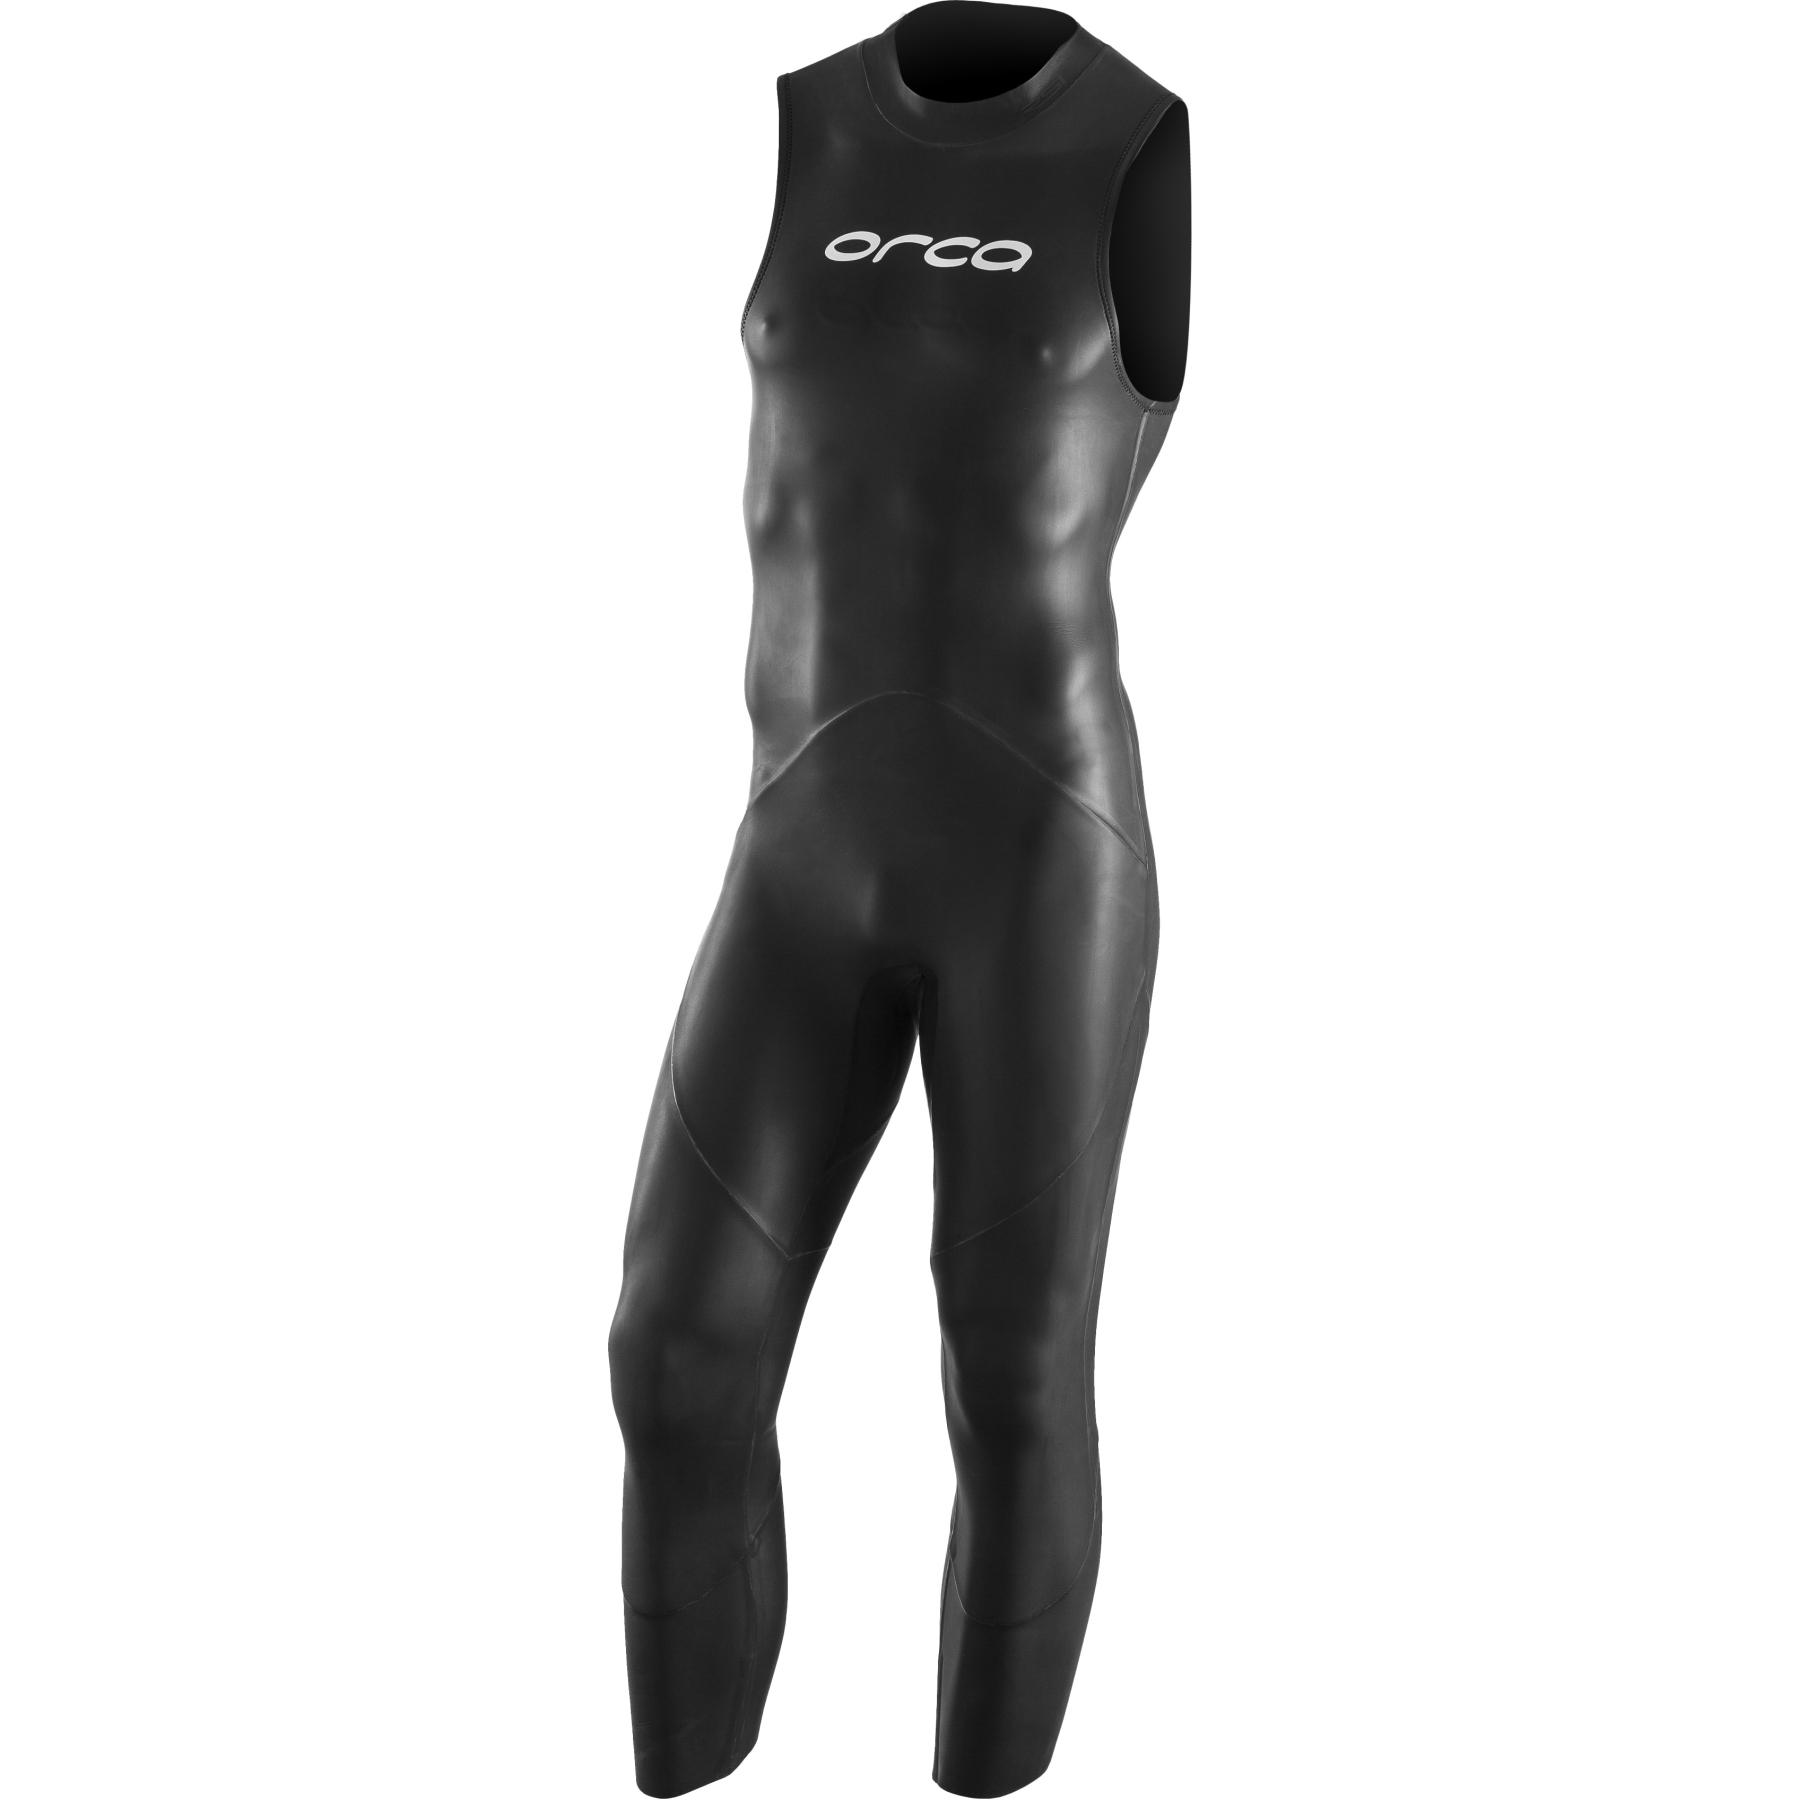 Orca RS1 Openwater Sleeveless Neoprenanzug - black